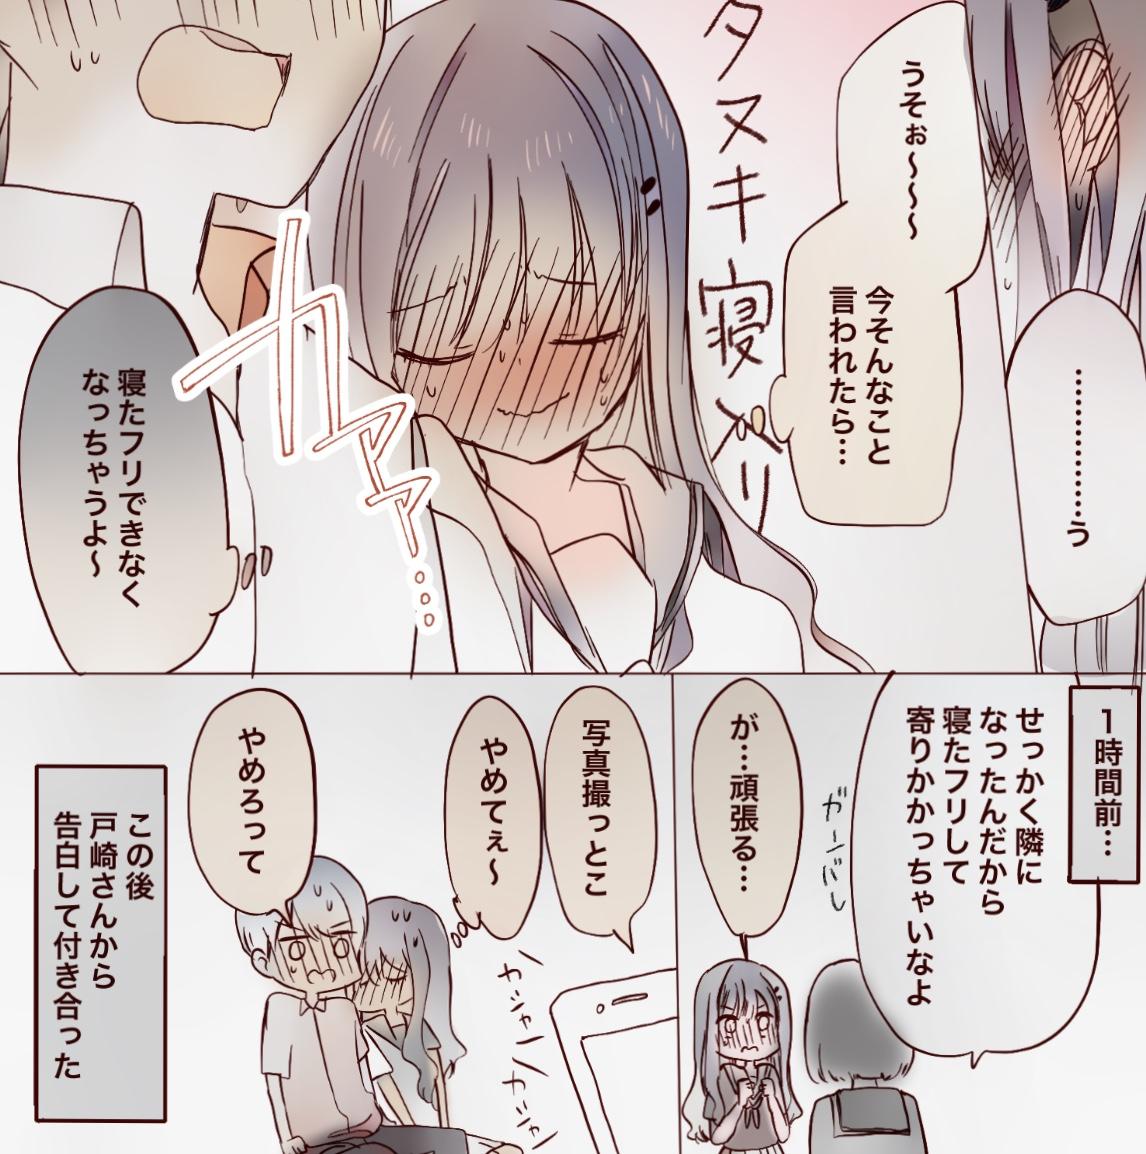 saku/うちの変態メイド【①〜⑤巻発売中】さんの投稿画像